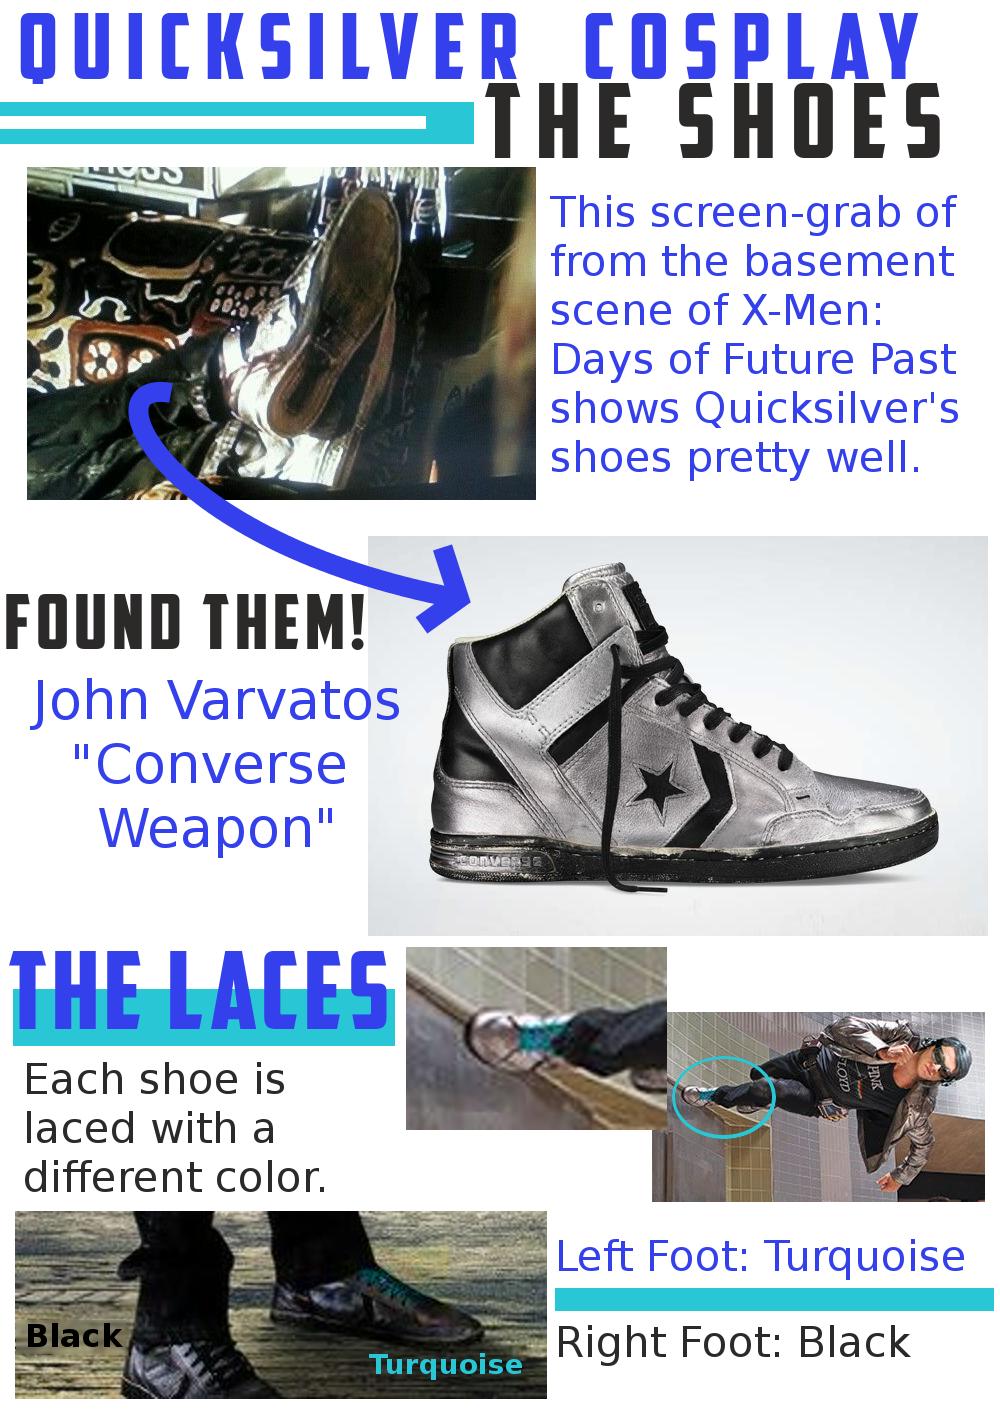 028fb848145 Quicksilver Cosplay. Quicksilver s Shoes. X-Men  Days of Future Past. xmen  cosplay